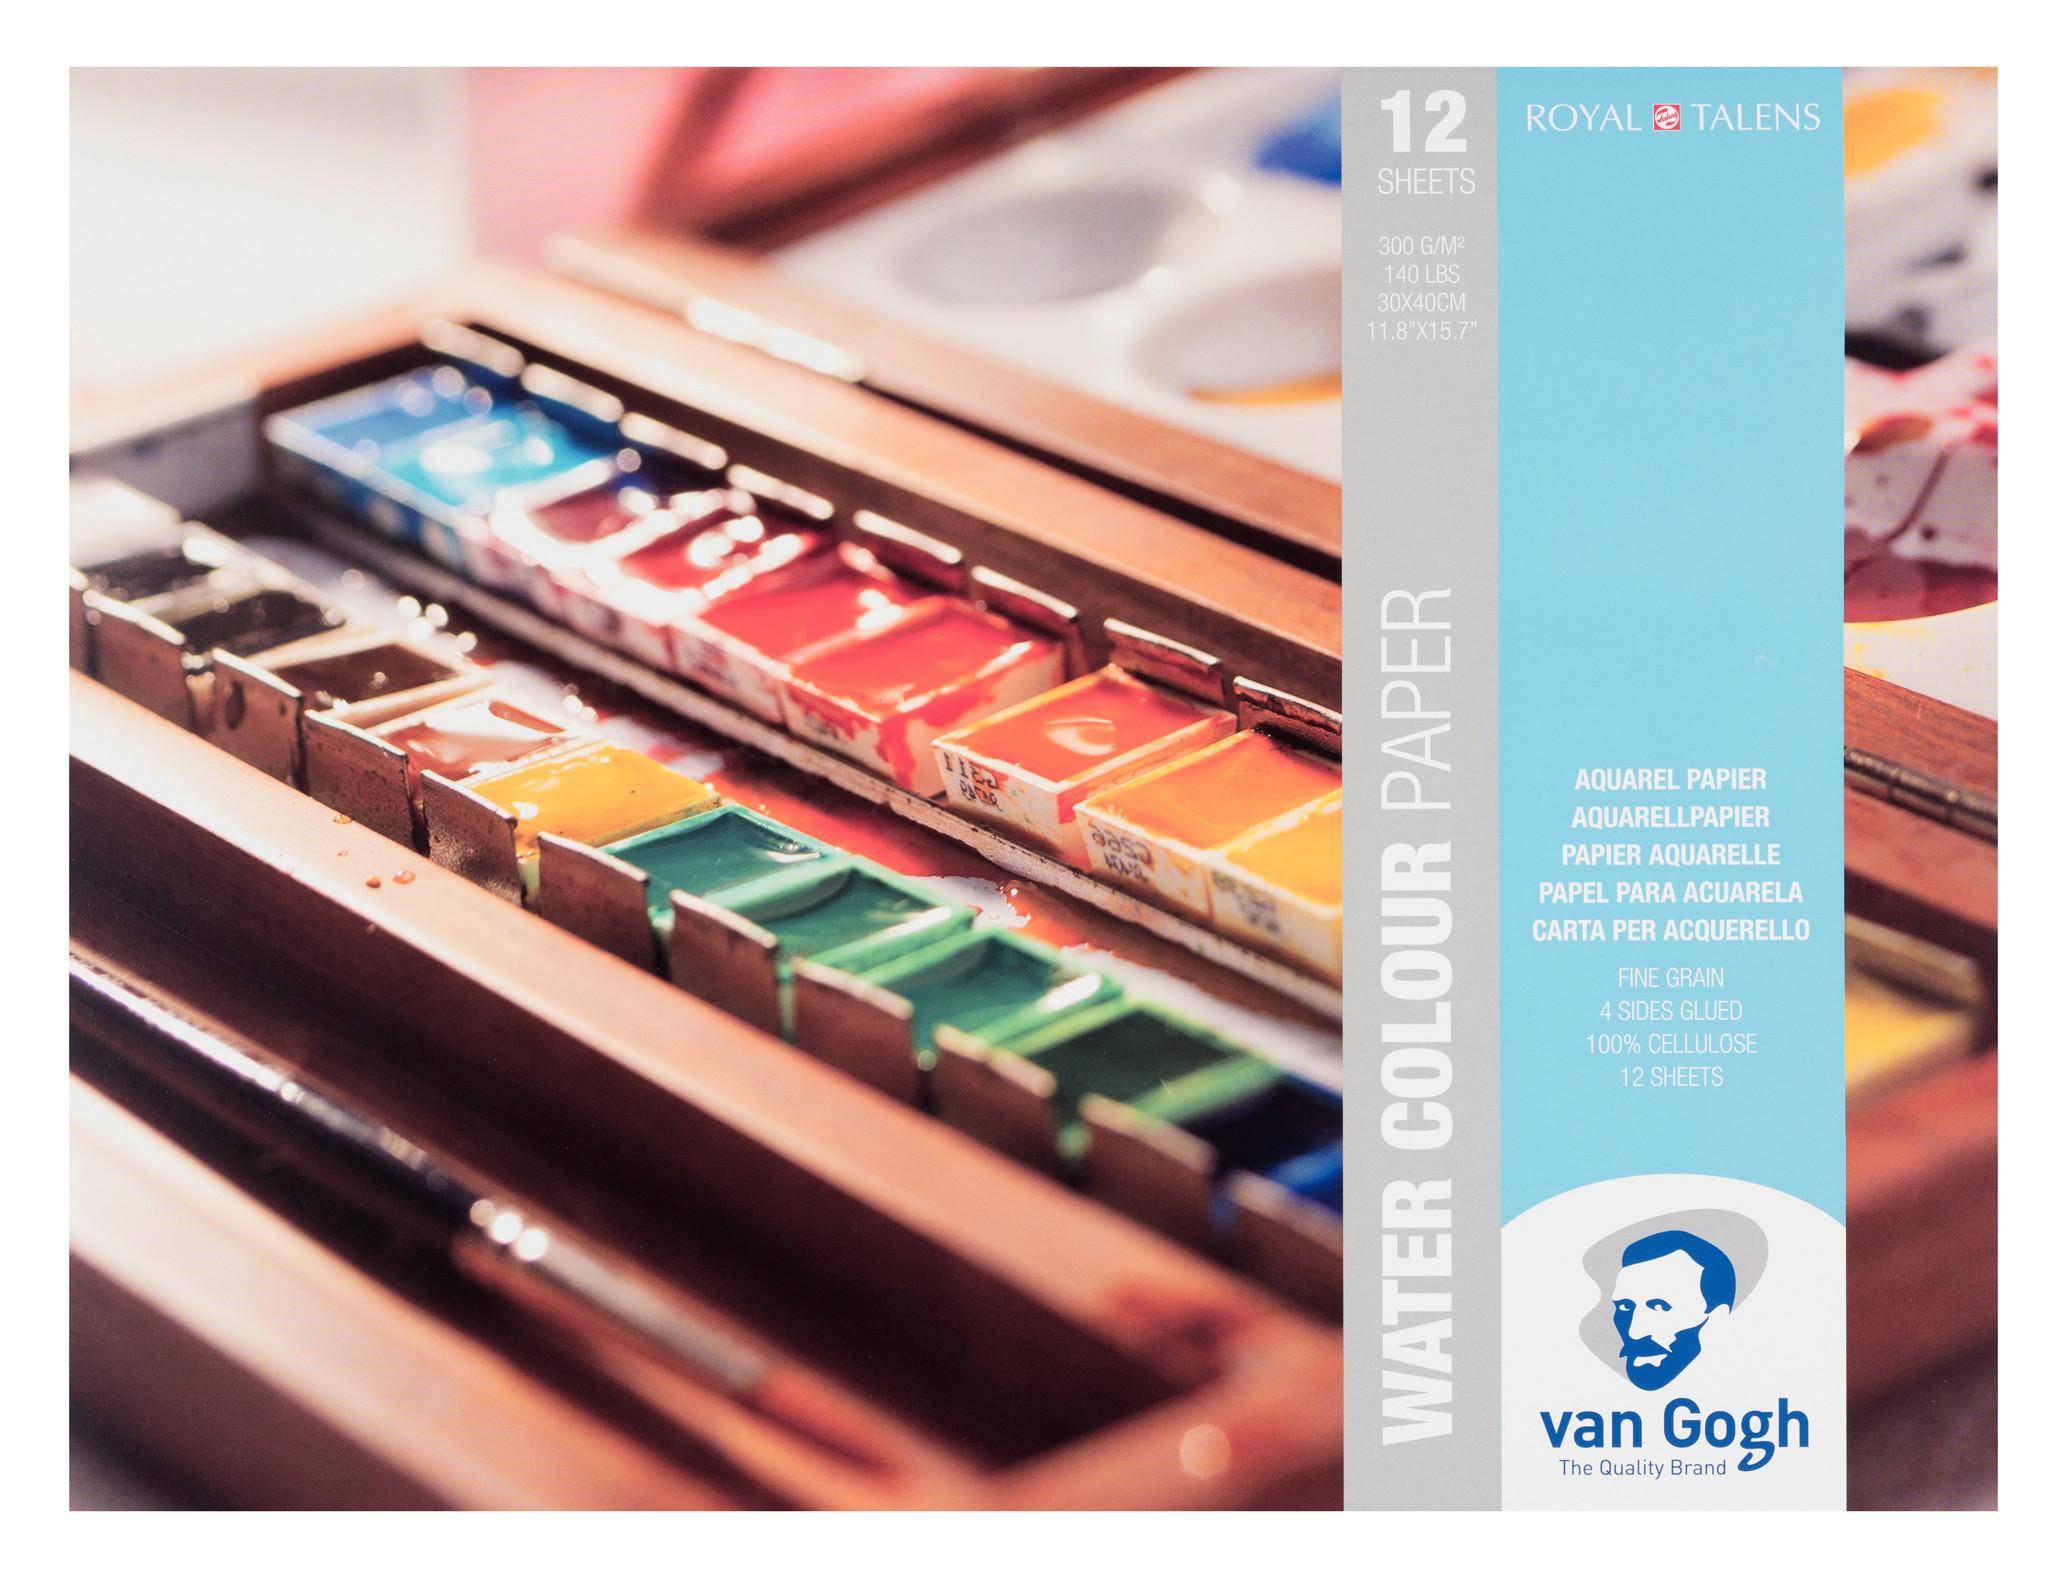 Van Gogh Water Colour Paper Block, 12 Sheets, 300g/140lb., size 30 x 40cm / 11.8 x 15.7